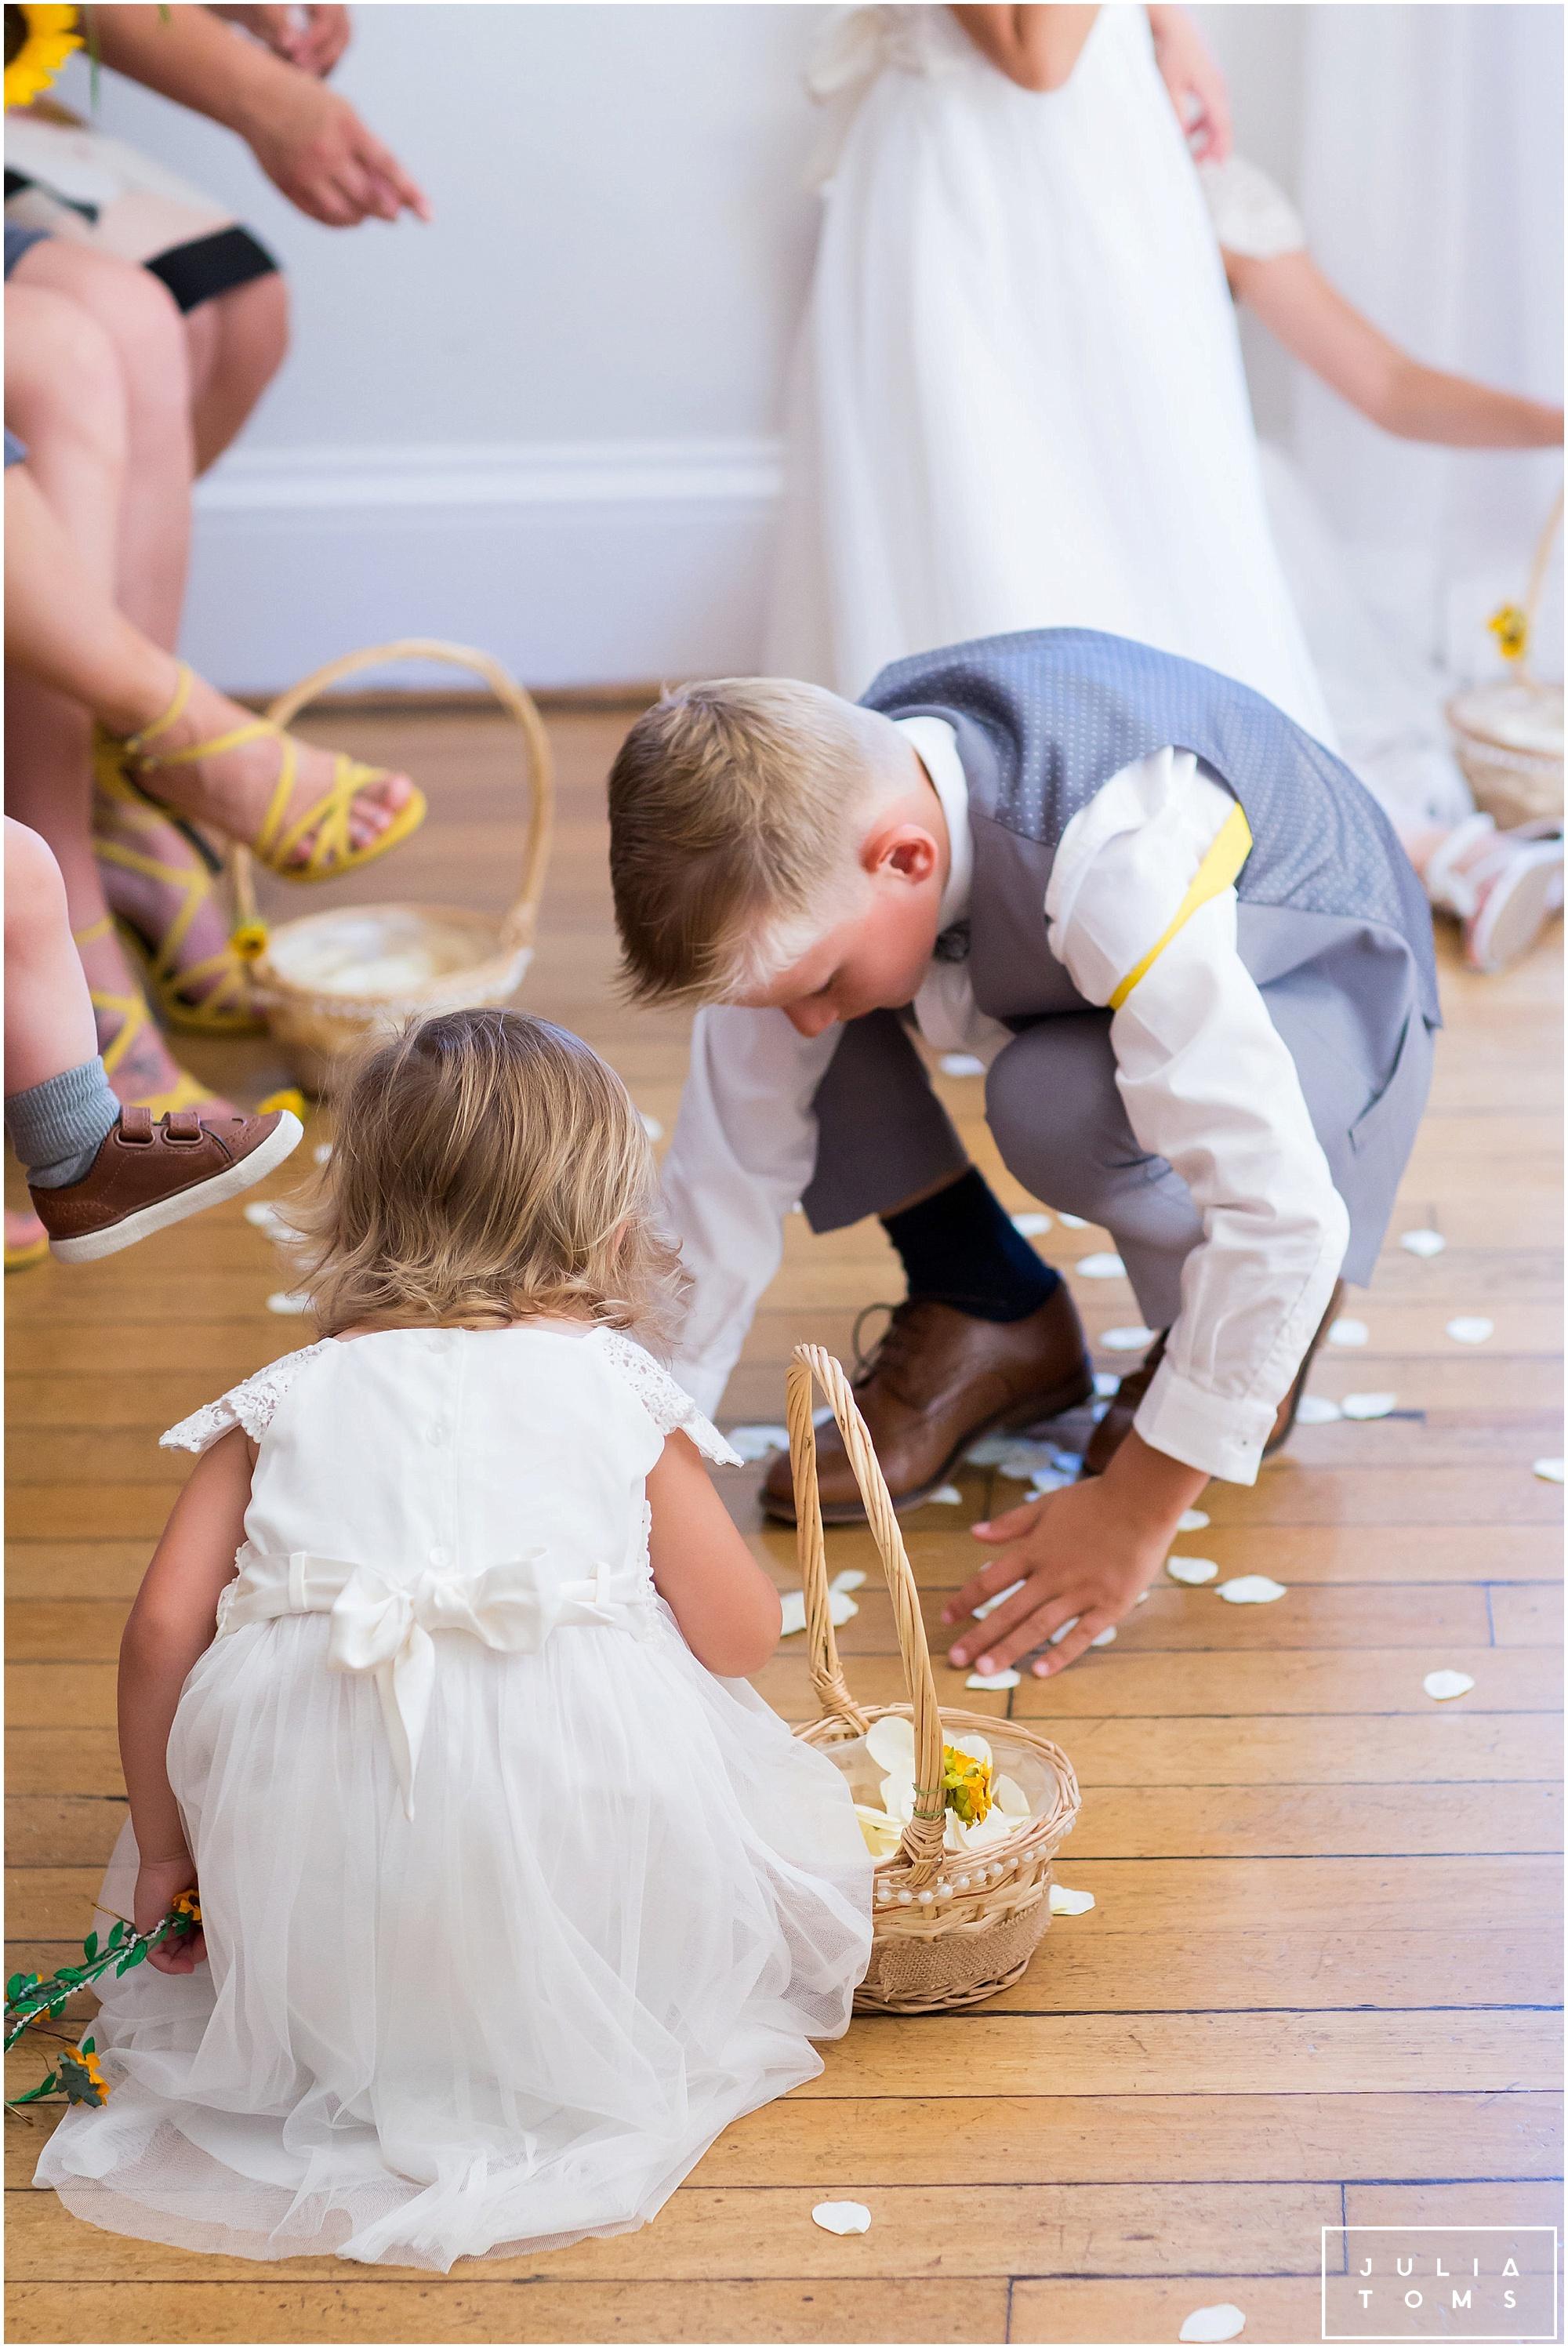 julia_toms_chichester_wedding_photographer_worthing_041.jpg